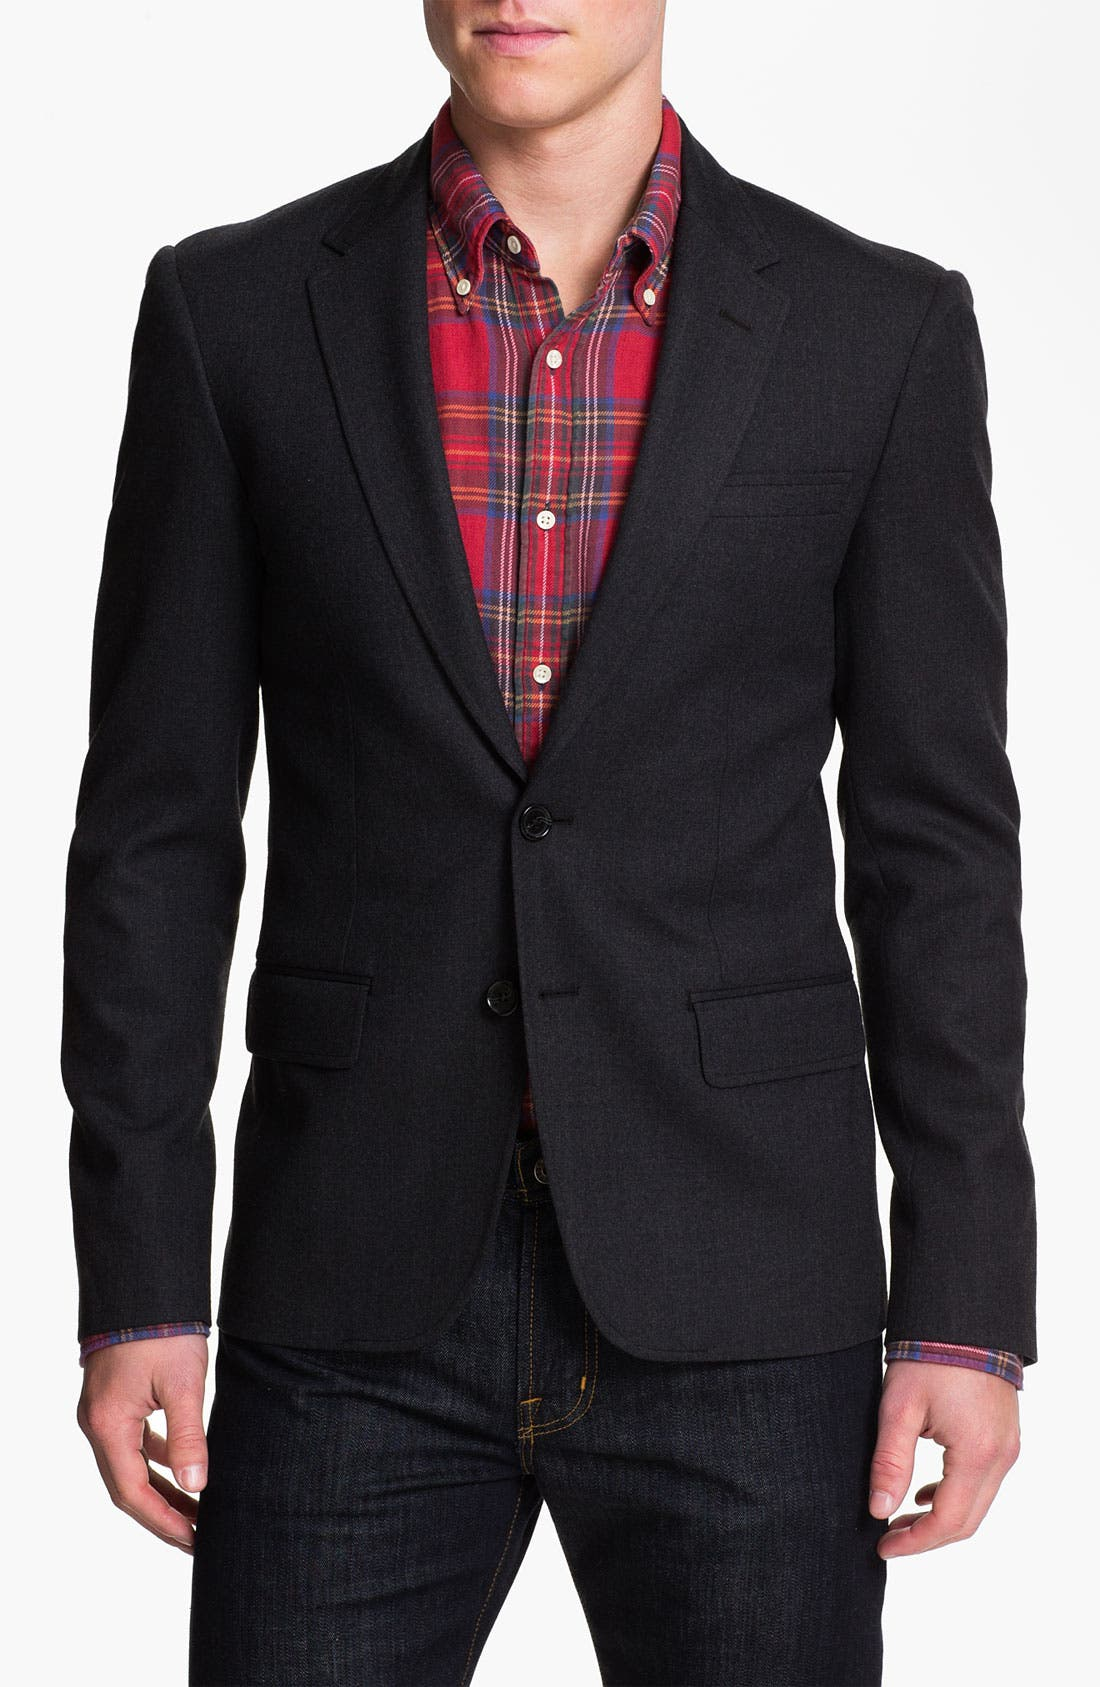 Main Image - Michael Kors Wool Blend Blazer with Leather Trim